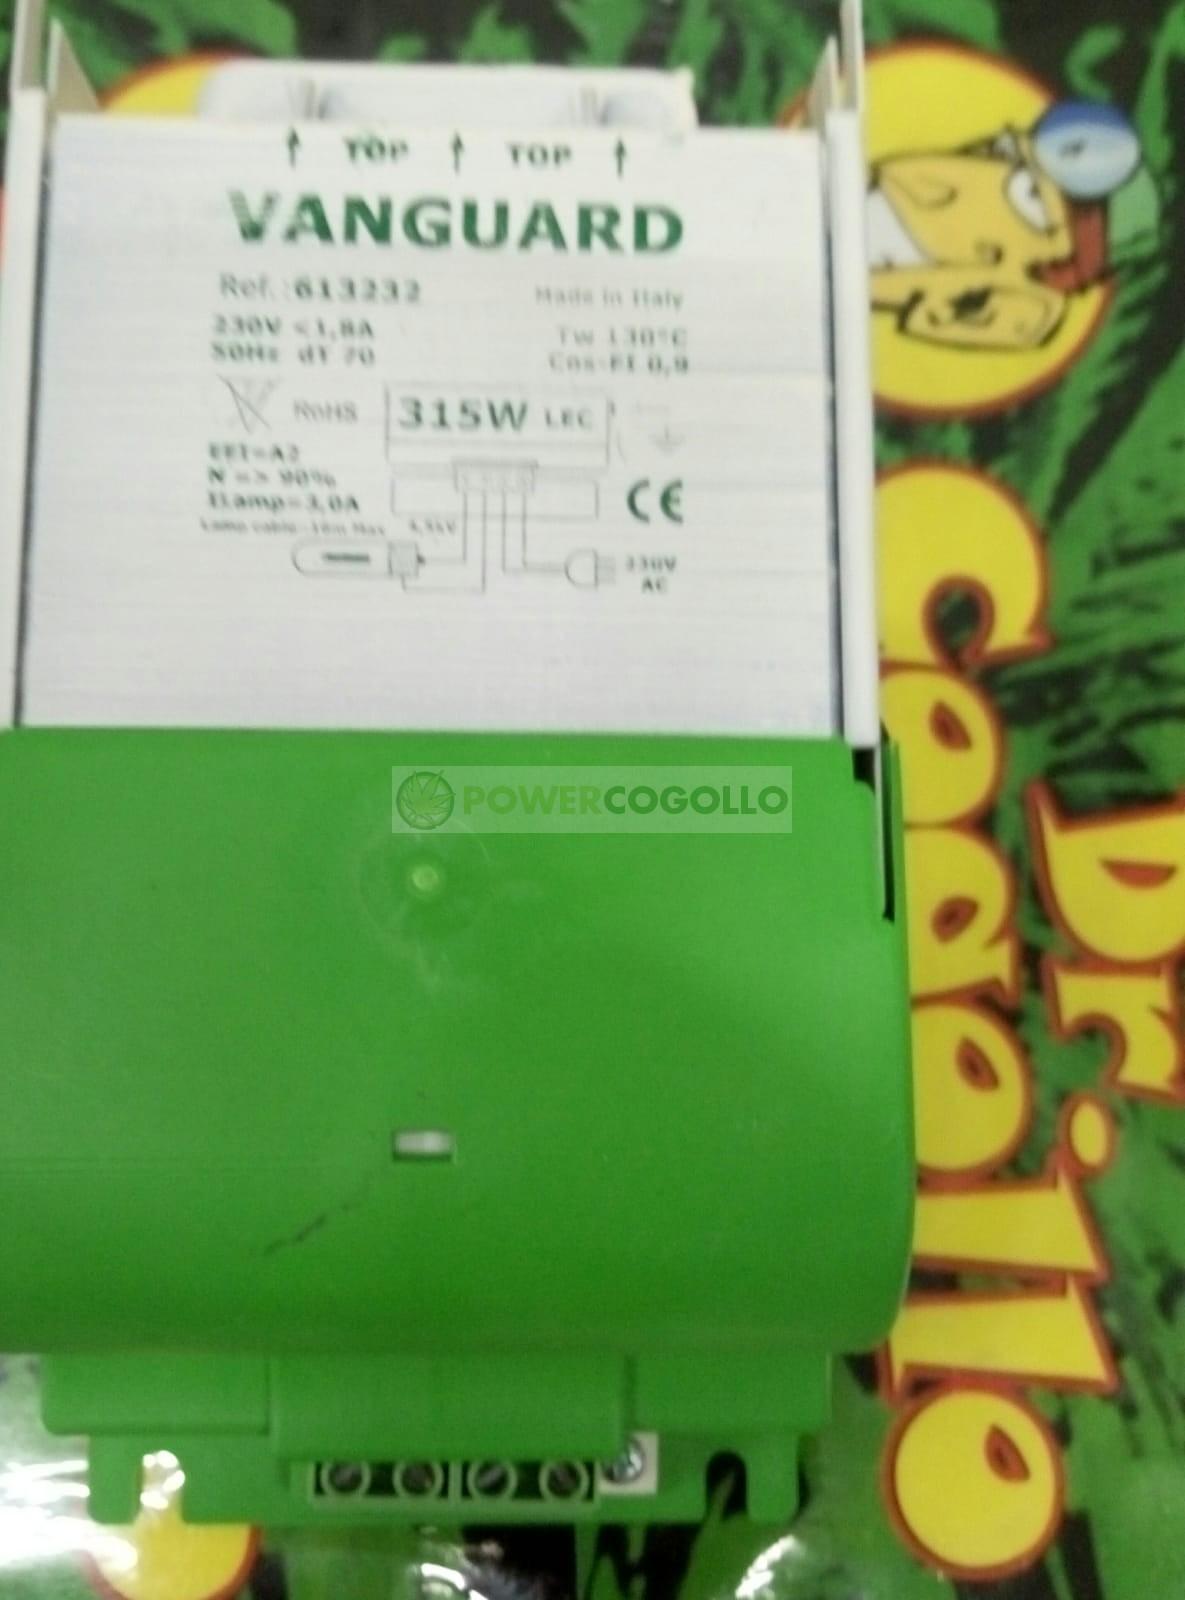 Balastro 315w Lec Electromagnético Vanguard 0